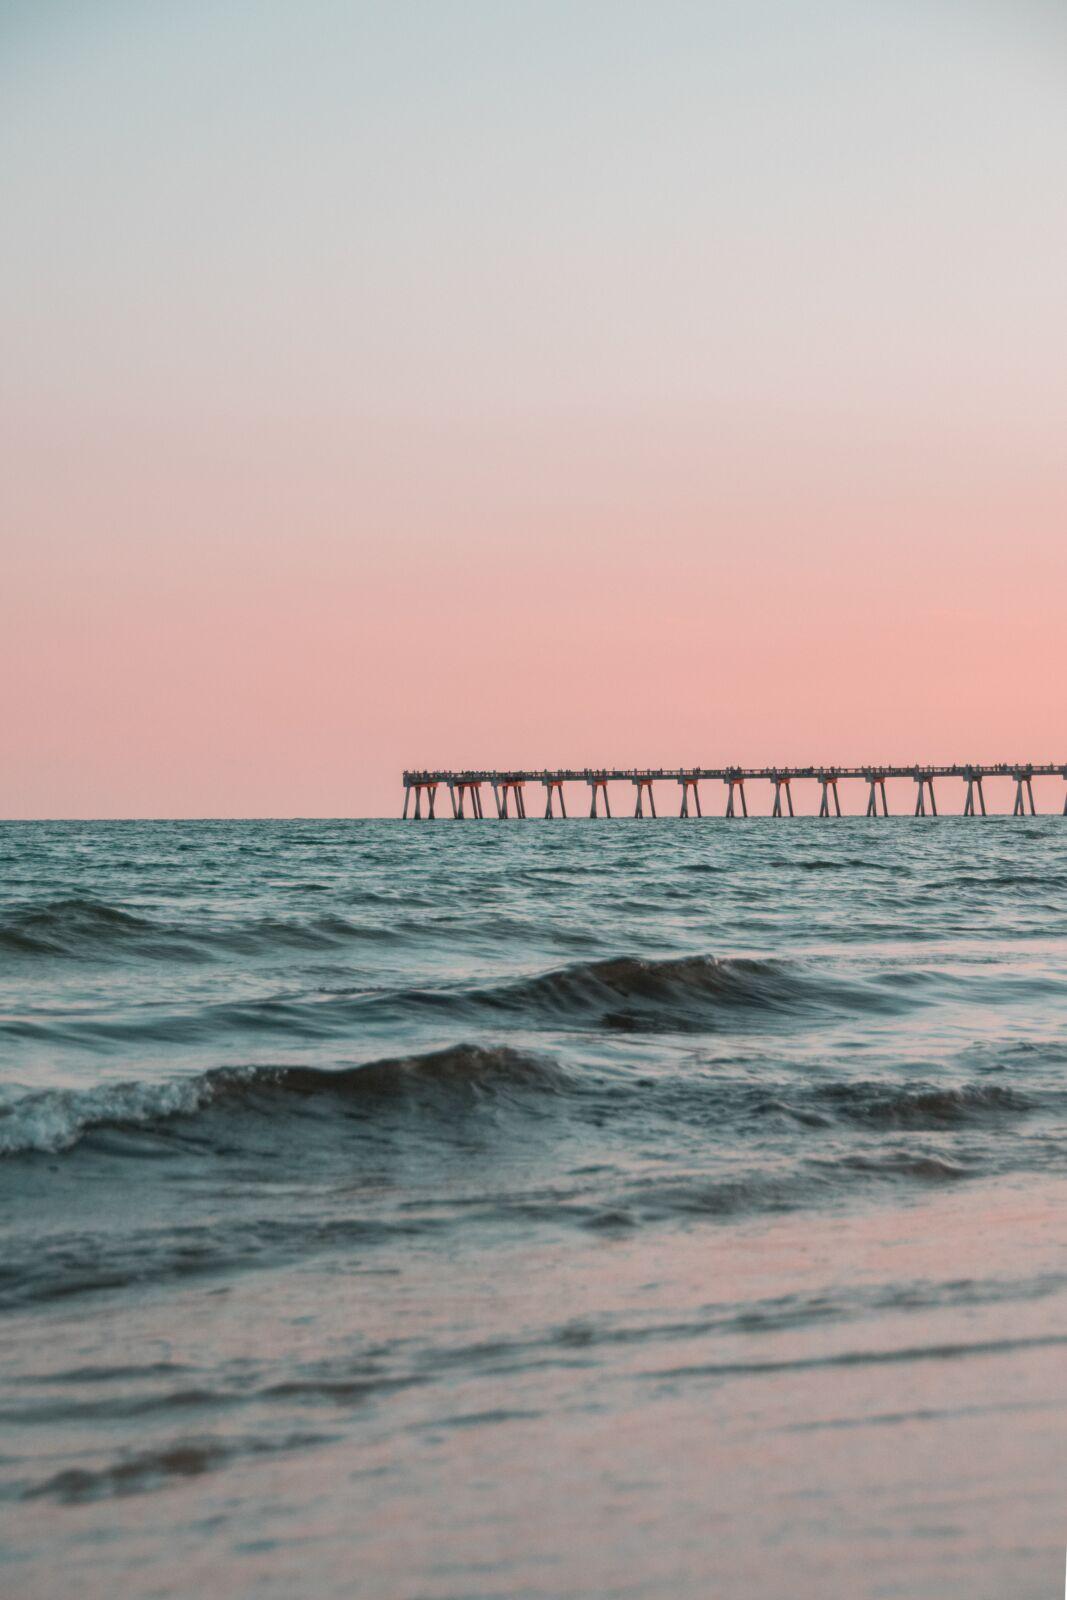 pier across the water